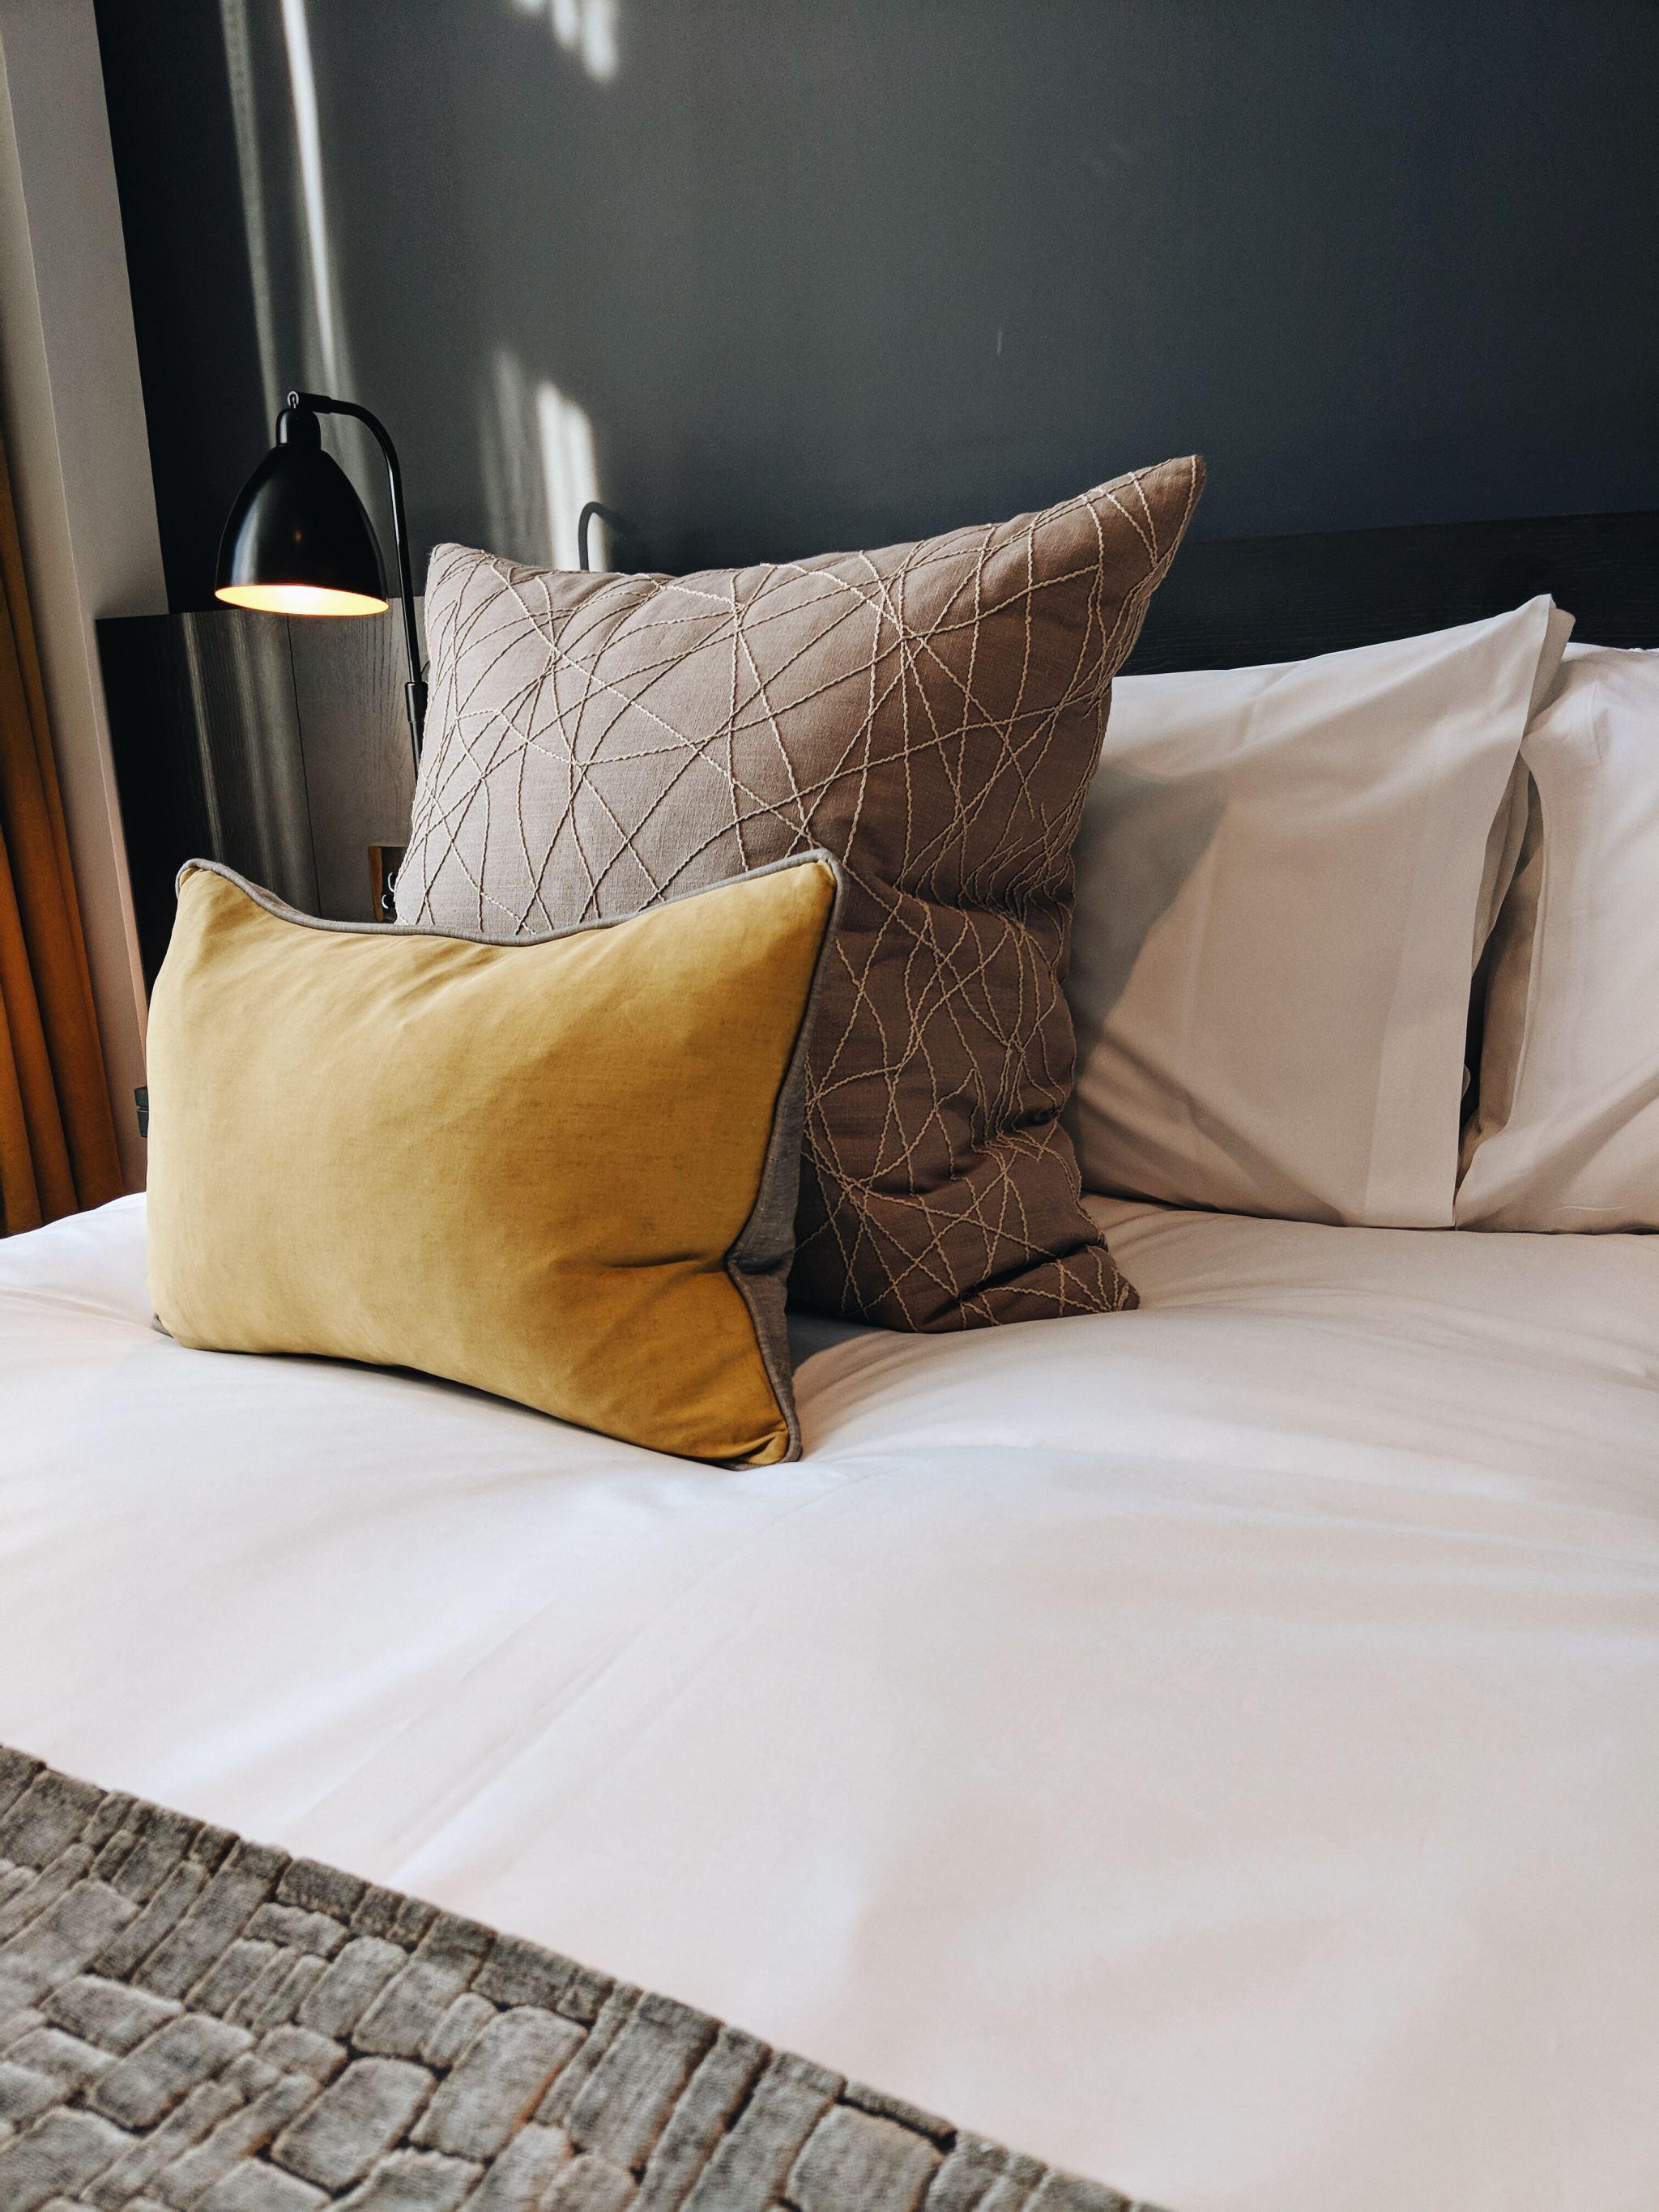 Cocoa Chelsea Apex Hotels City of Bath